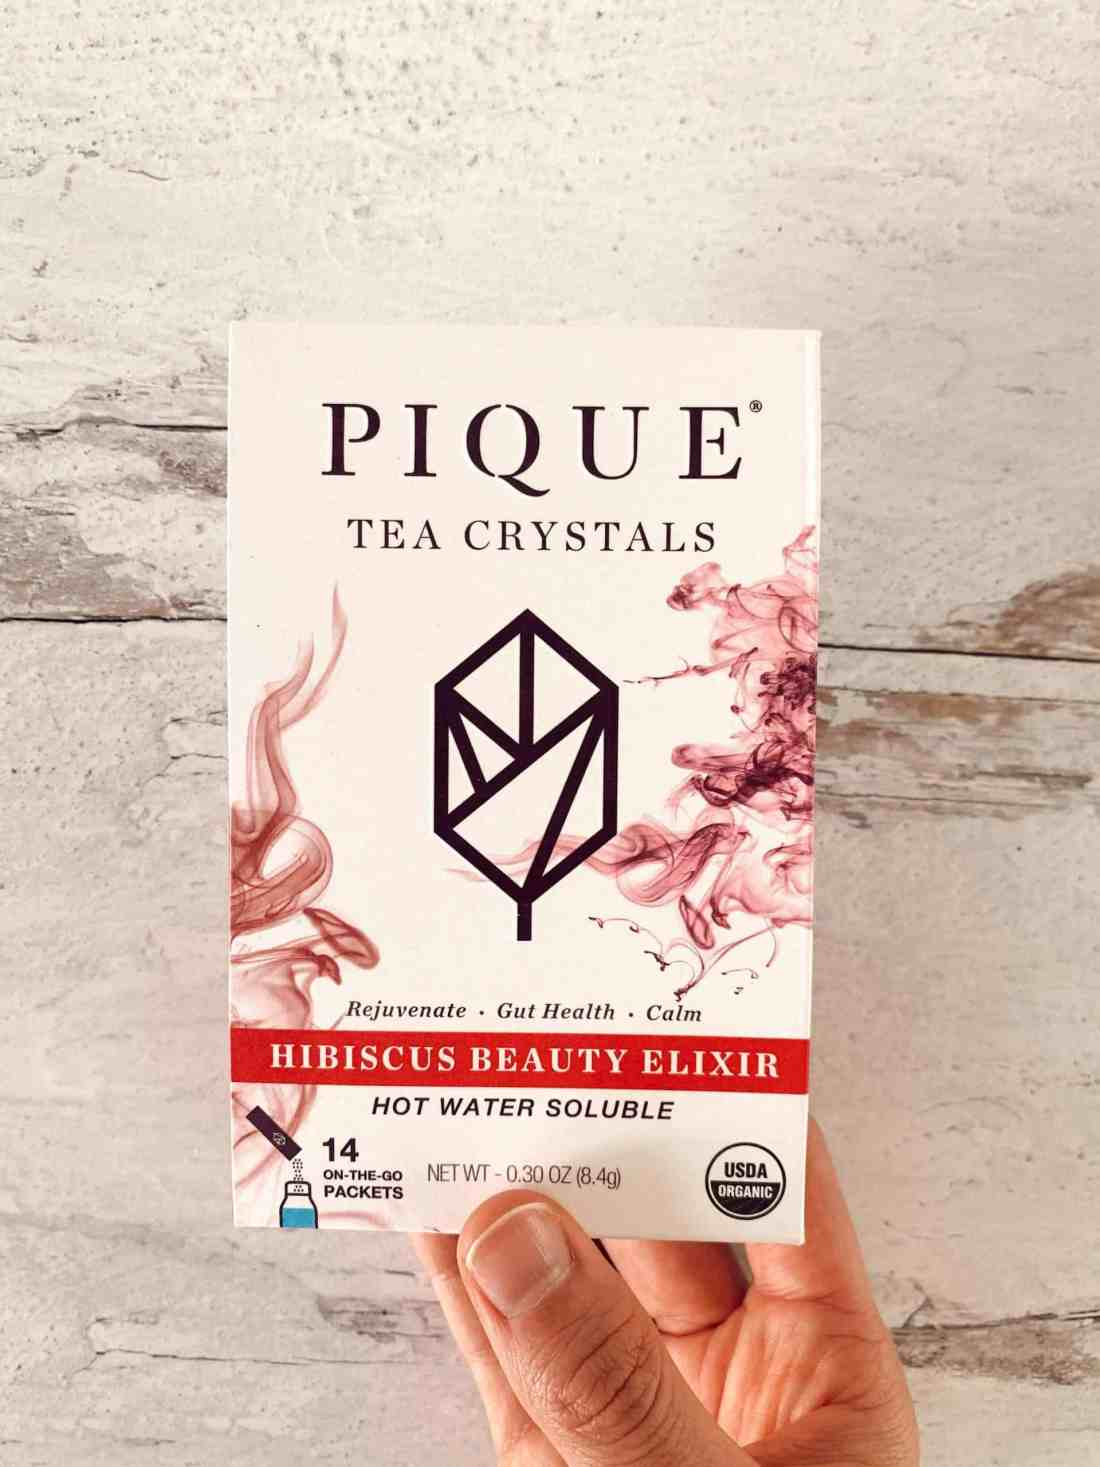 Holding the Pique Tea Hibiscus Beauty Elixir box.